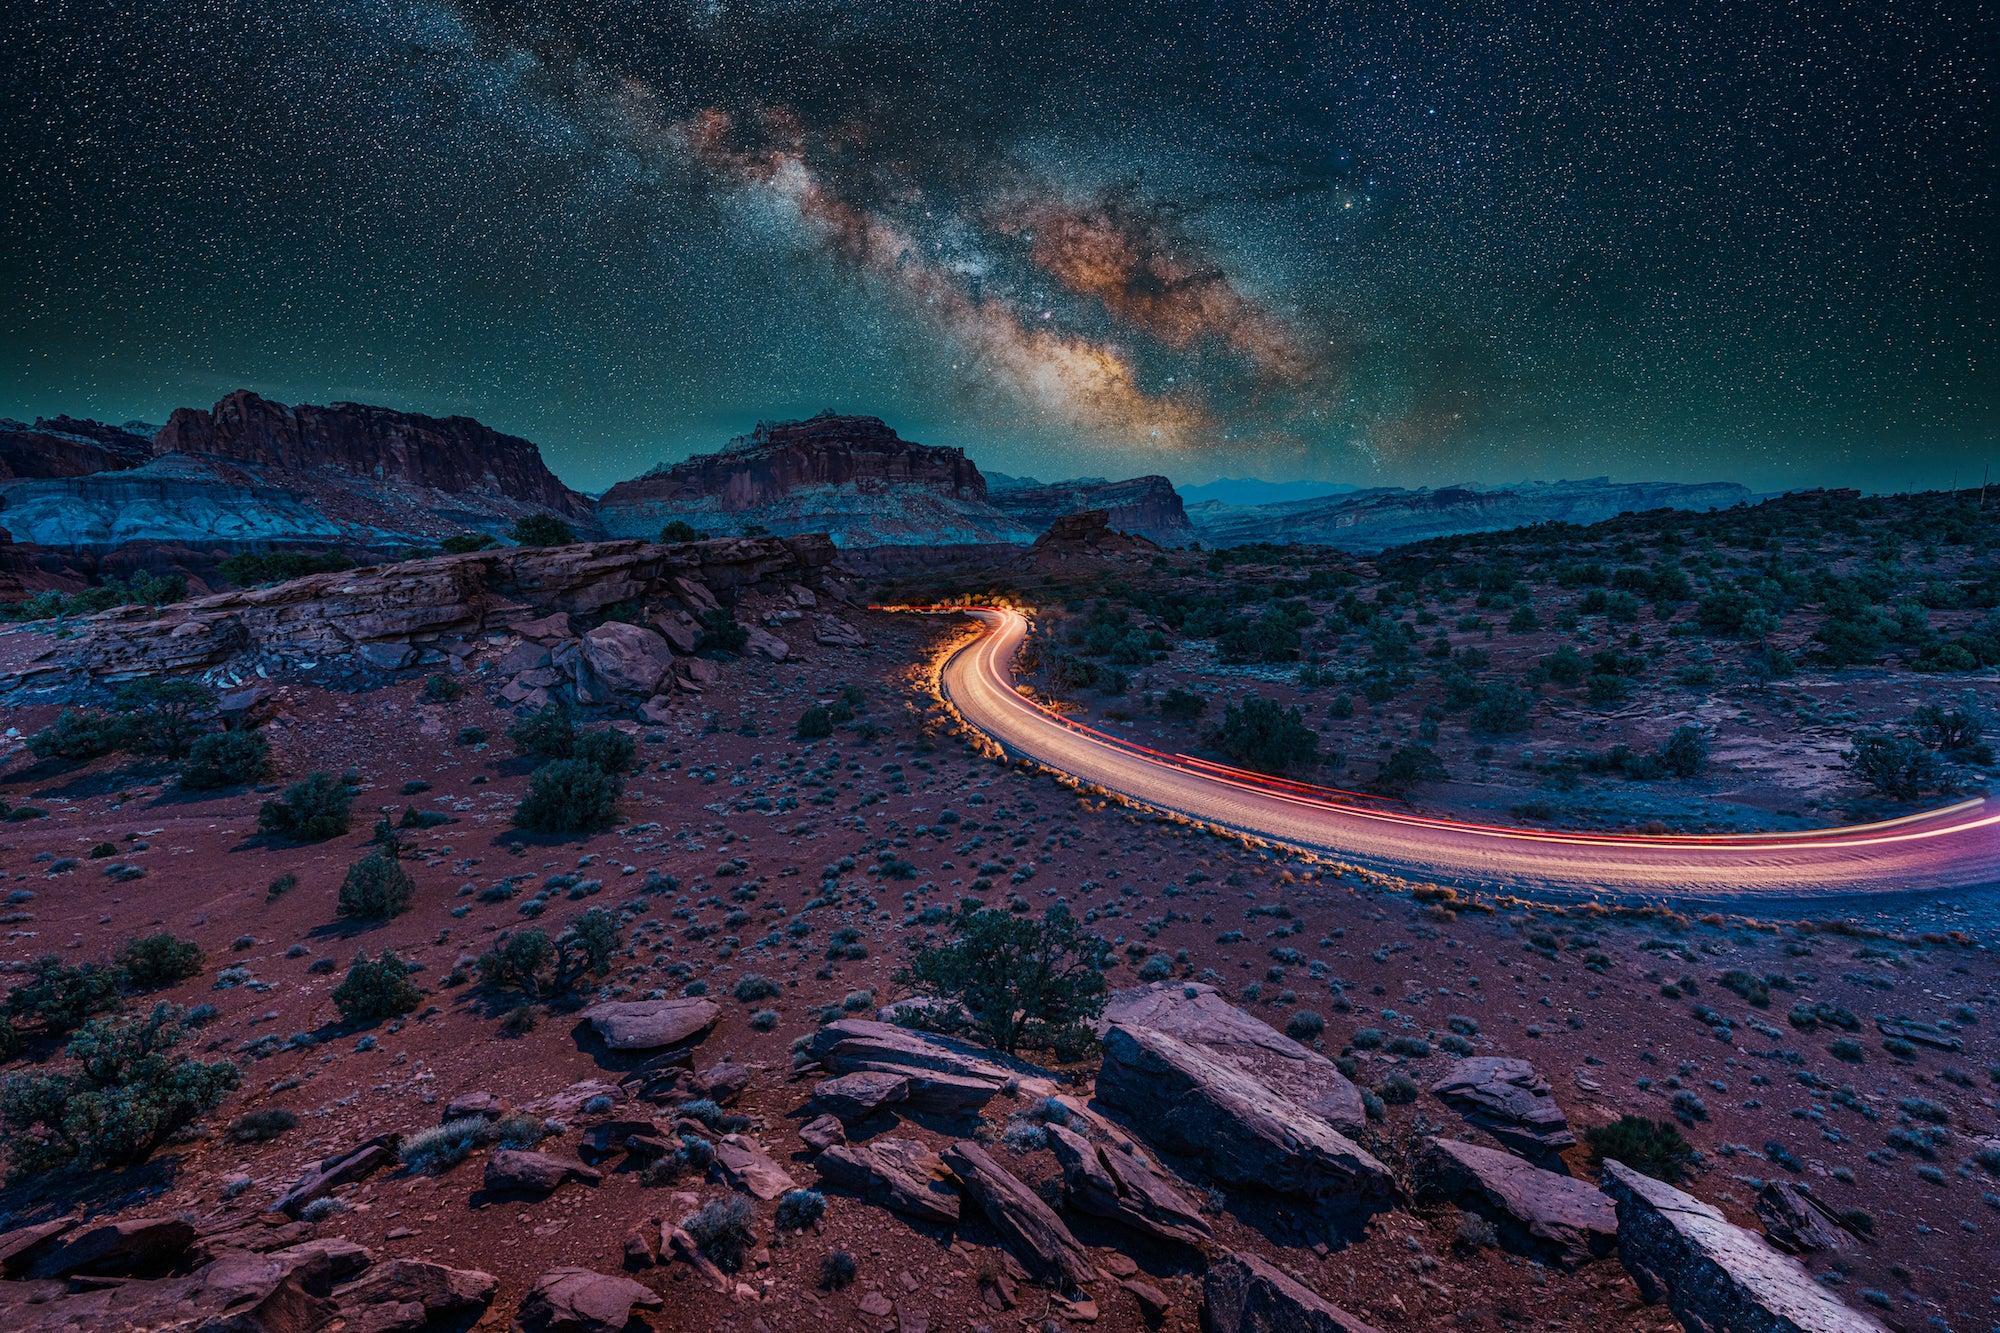 Alpha-Universe-BTS-Stan-Moniz-14mmGM-Milky-Way-Car-Trail-1.jpg